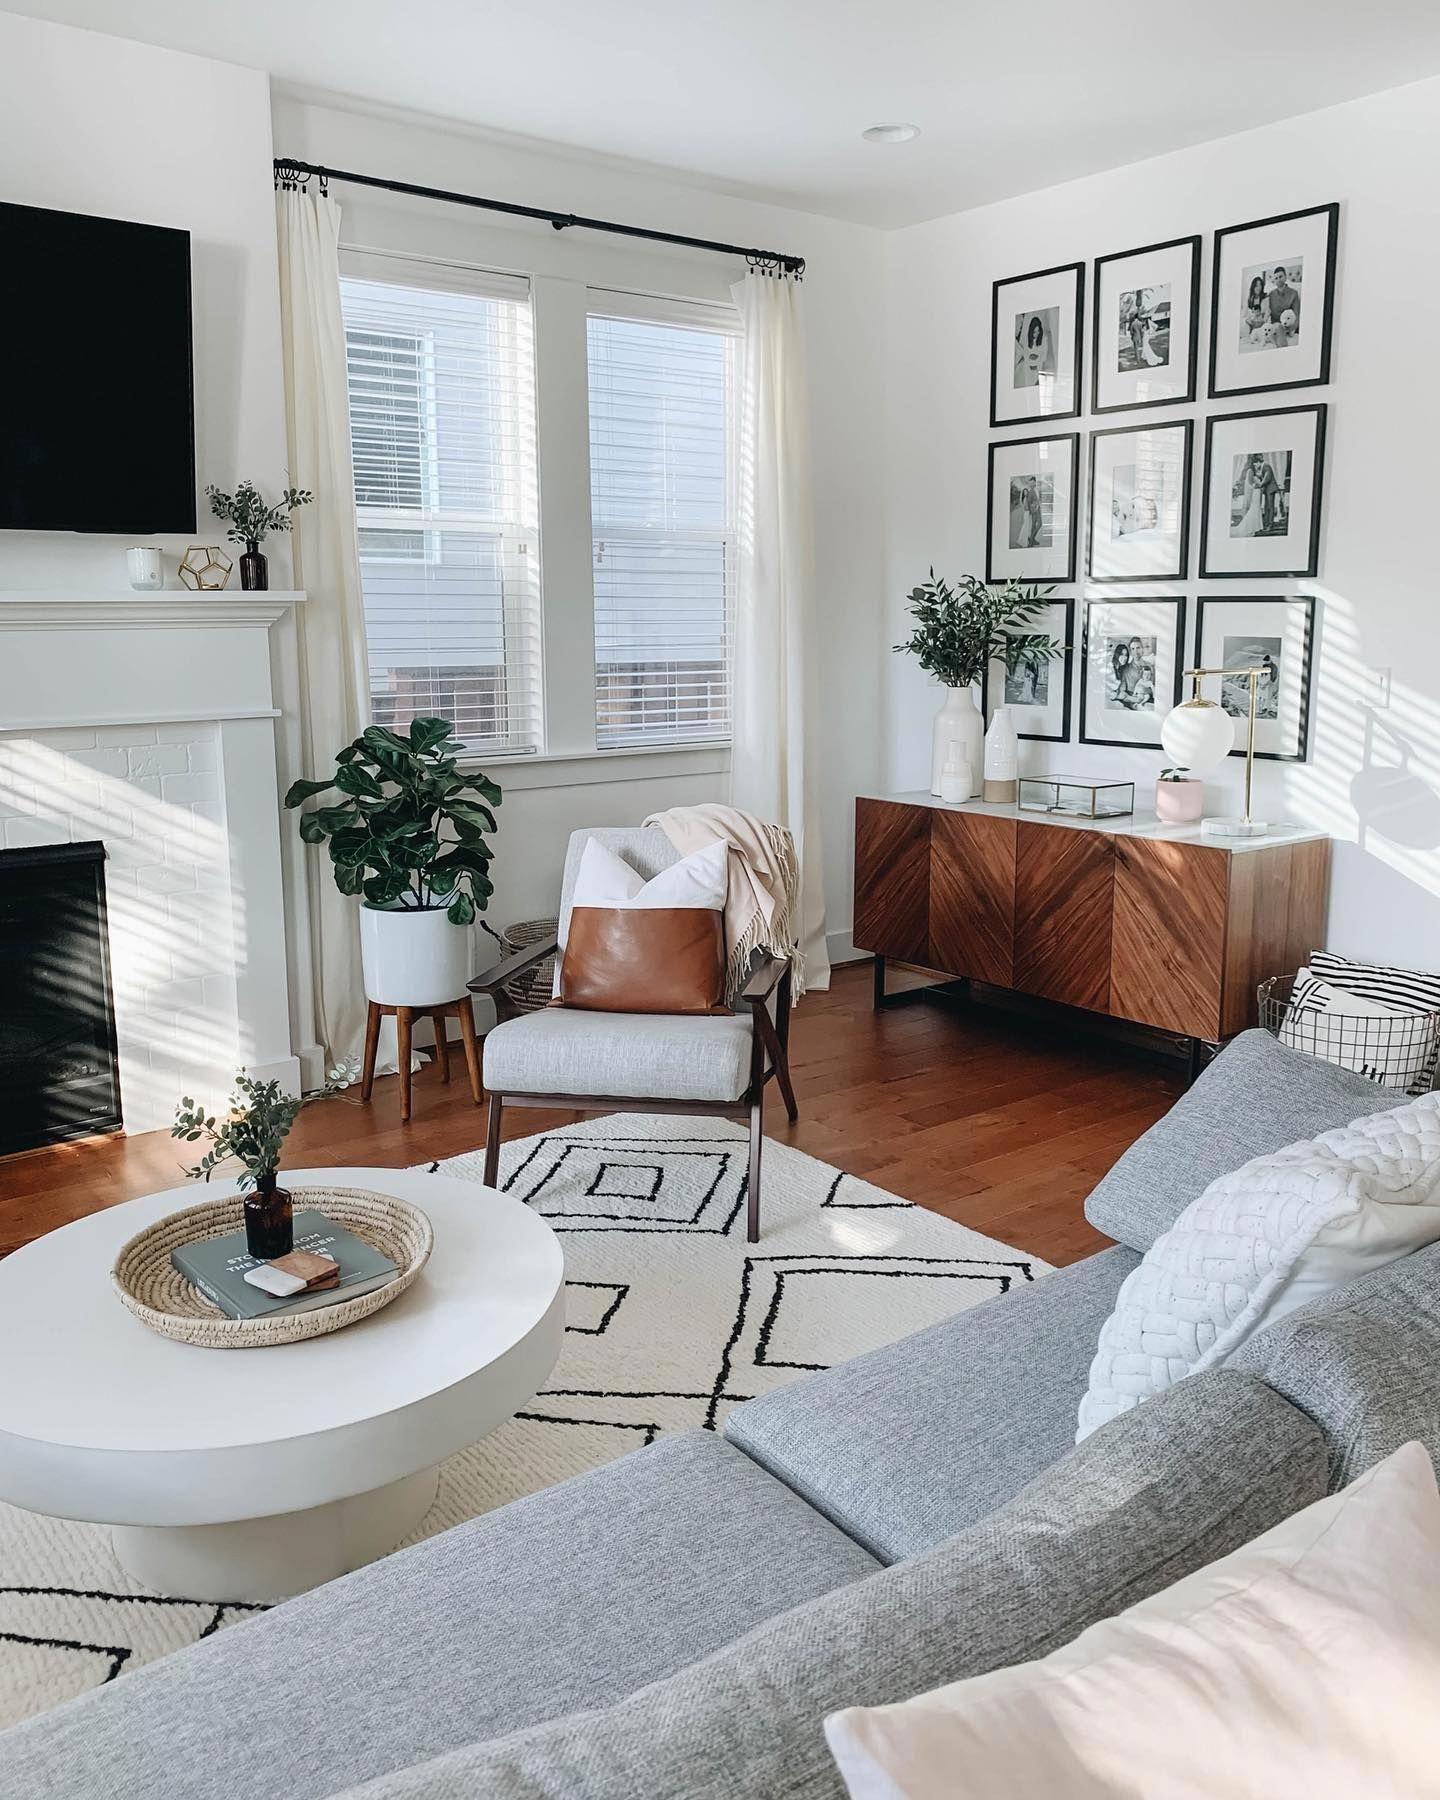 15 Impressive Home Remodel Entryway Stupefying Ideas Living Room Decor Apartment Cheap Home Decor Apartment Decor